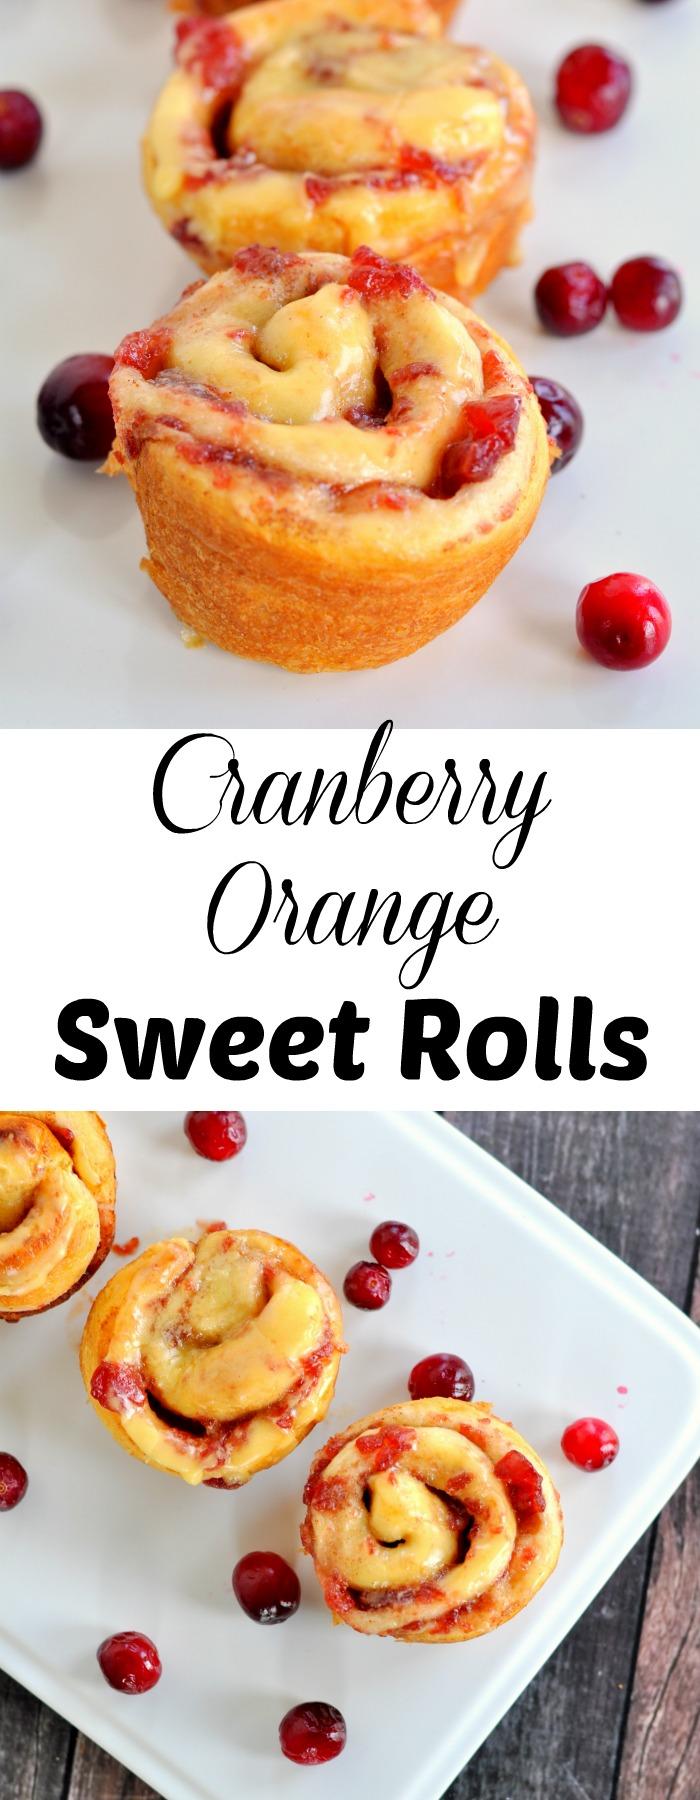 Cranberry orange sweet rolls are the perfect breakfast treat.